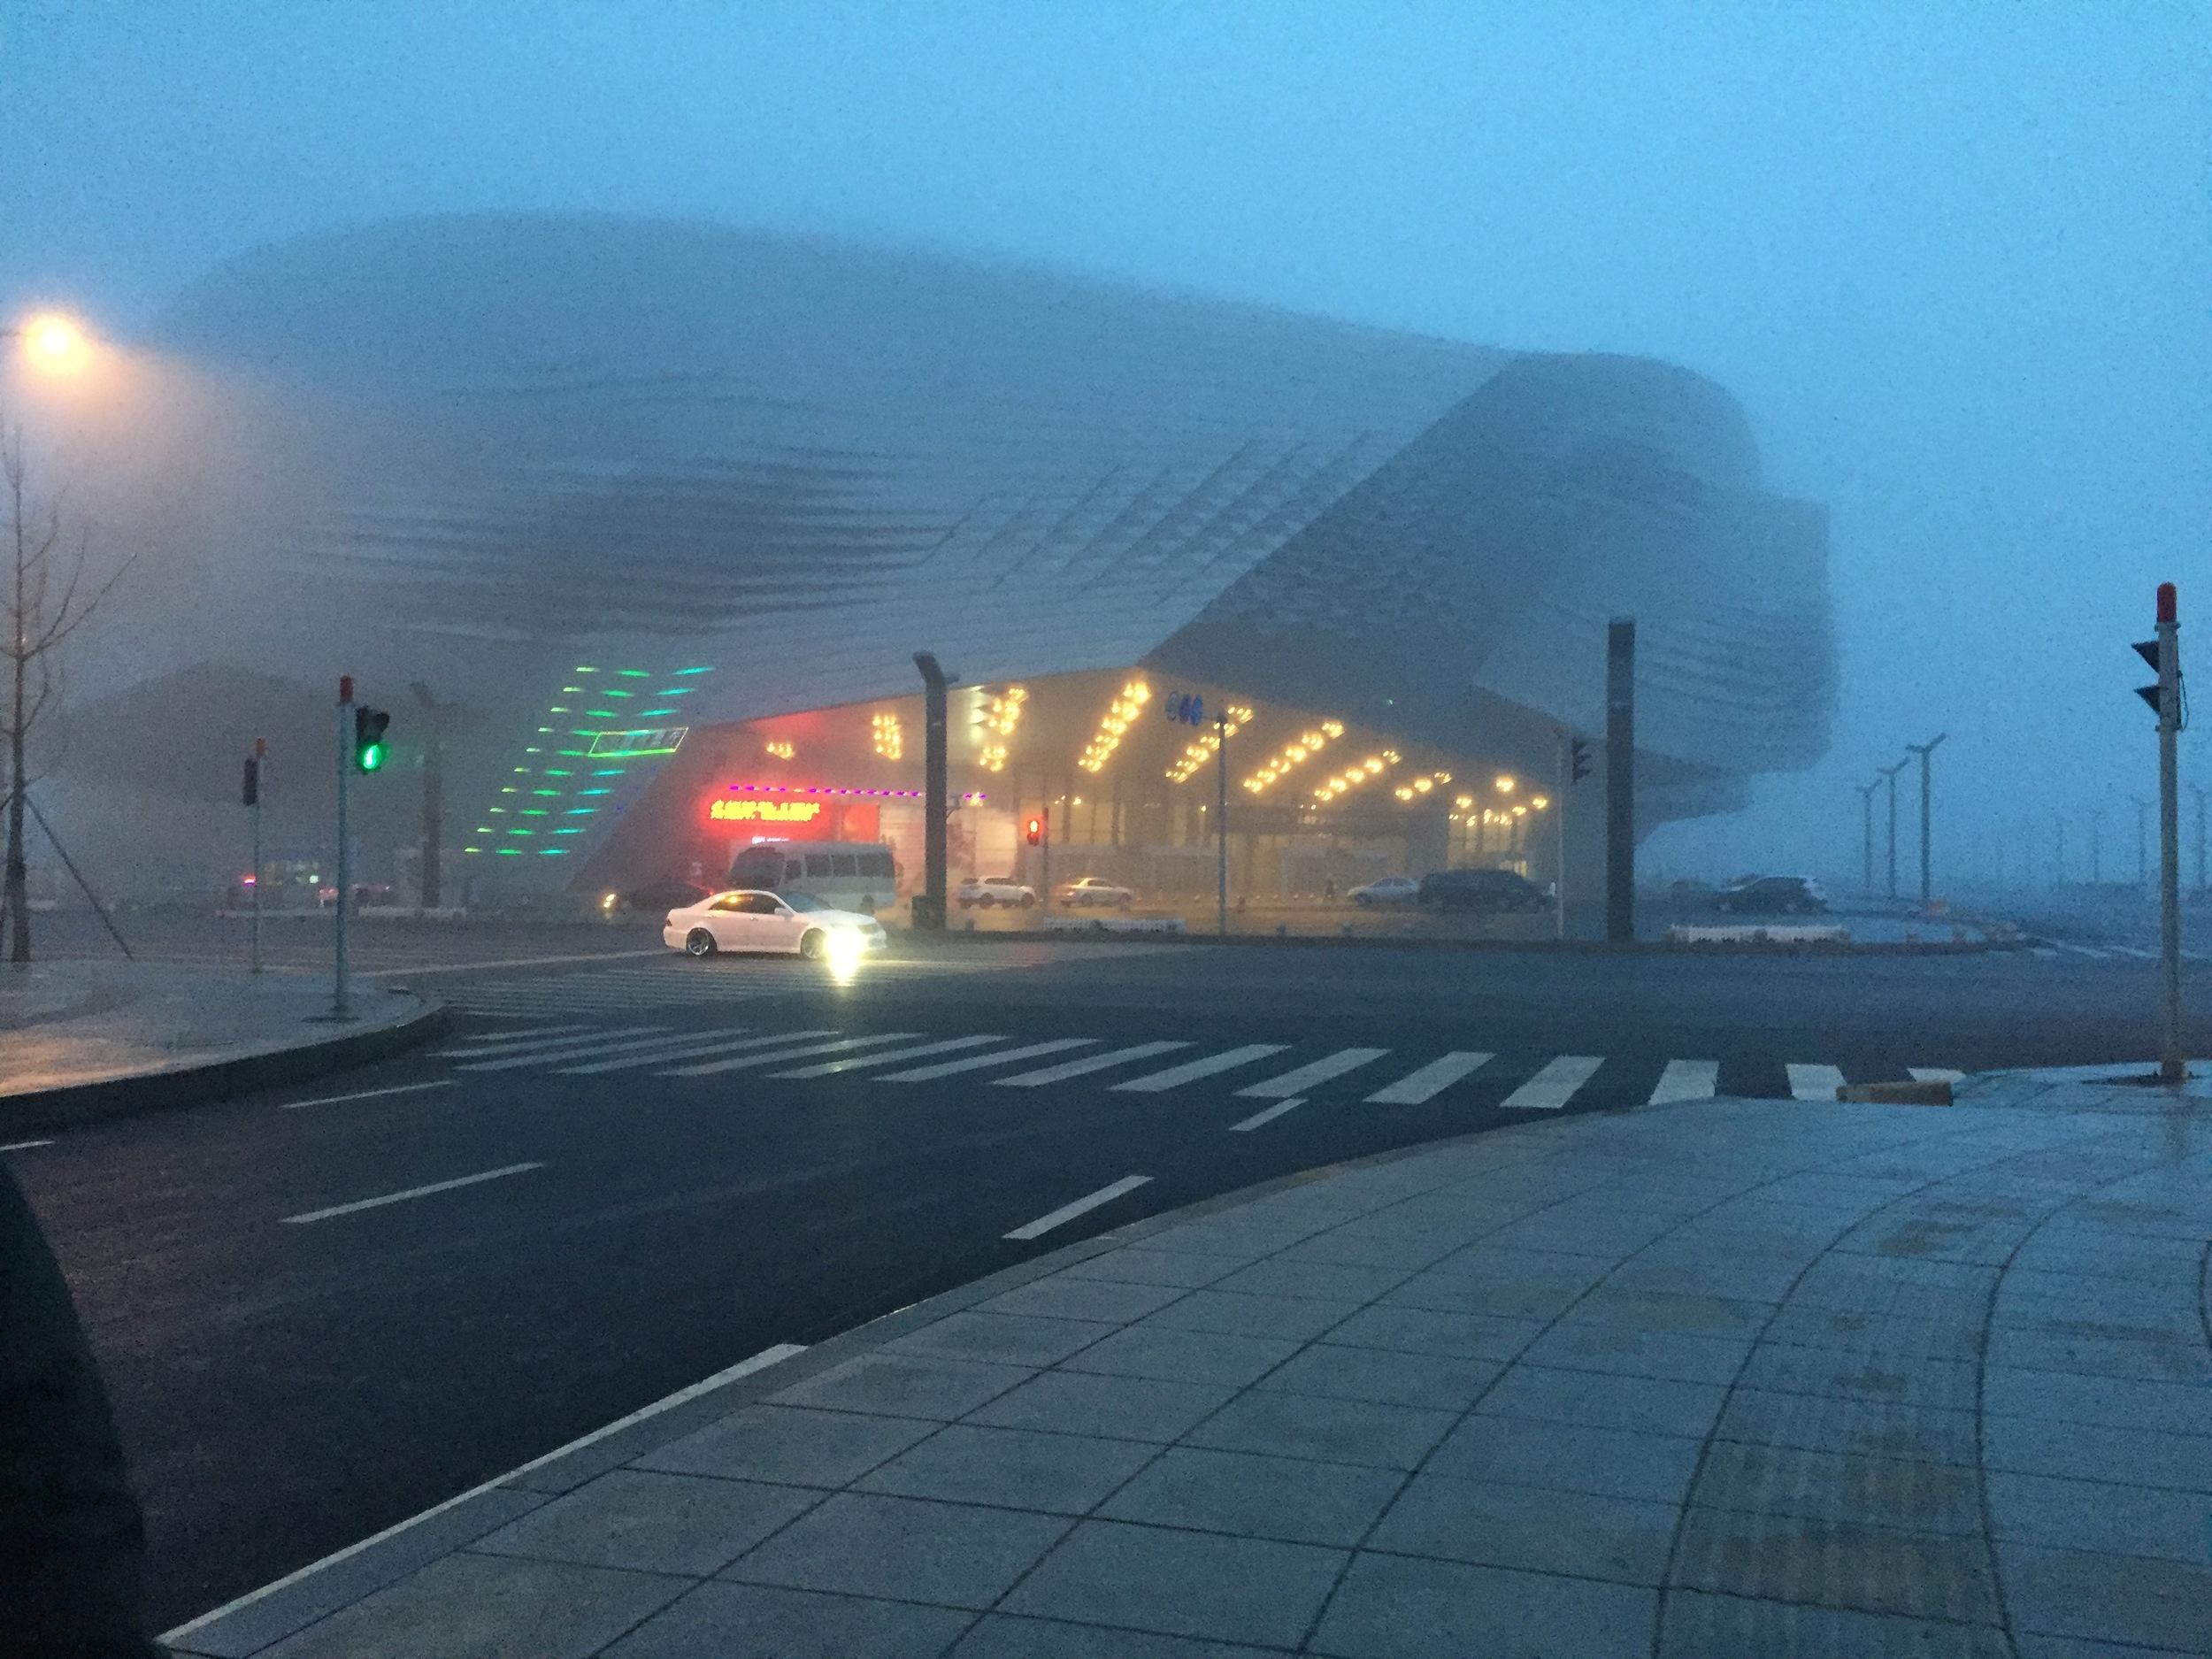 Misty neat architecture.